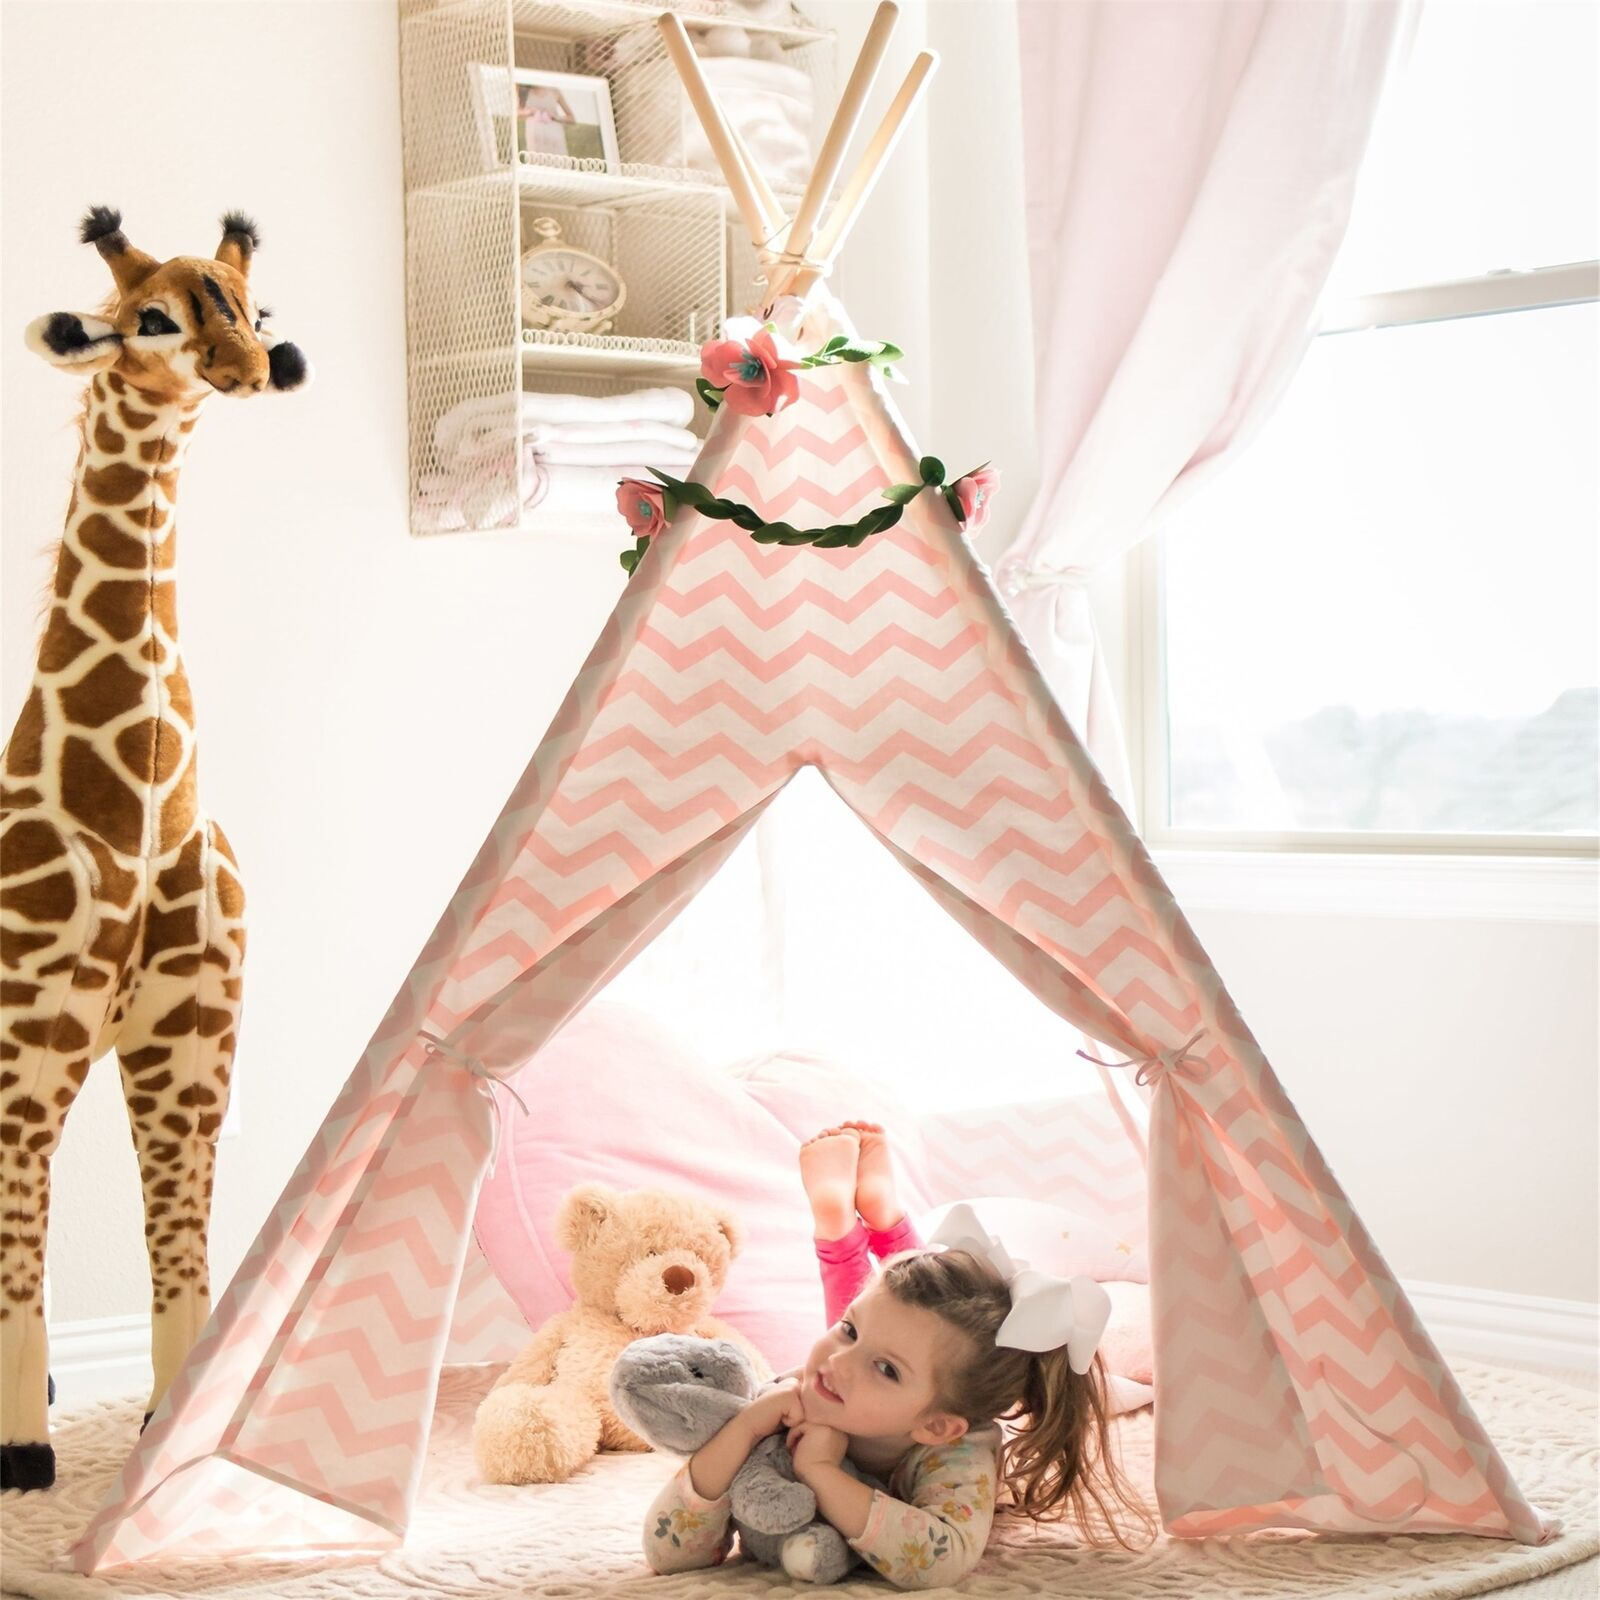 Tiny Land 6ft Rosa Chevron Cotton Canvas Tipi Zelt für Kinder Mädchen Spielzelt